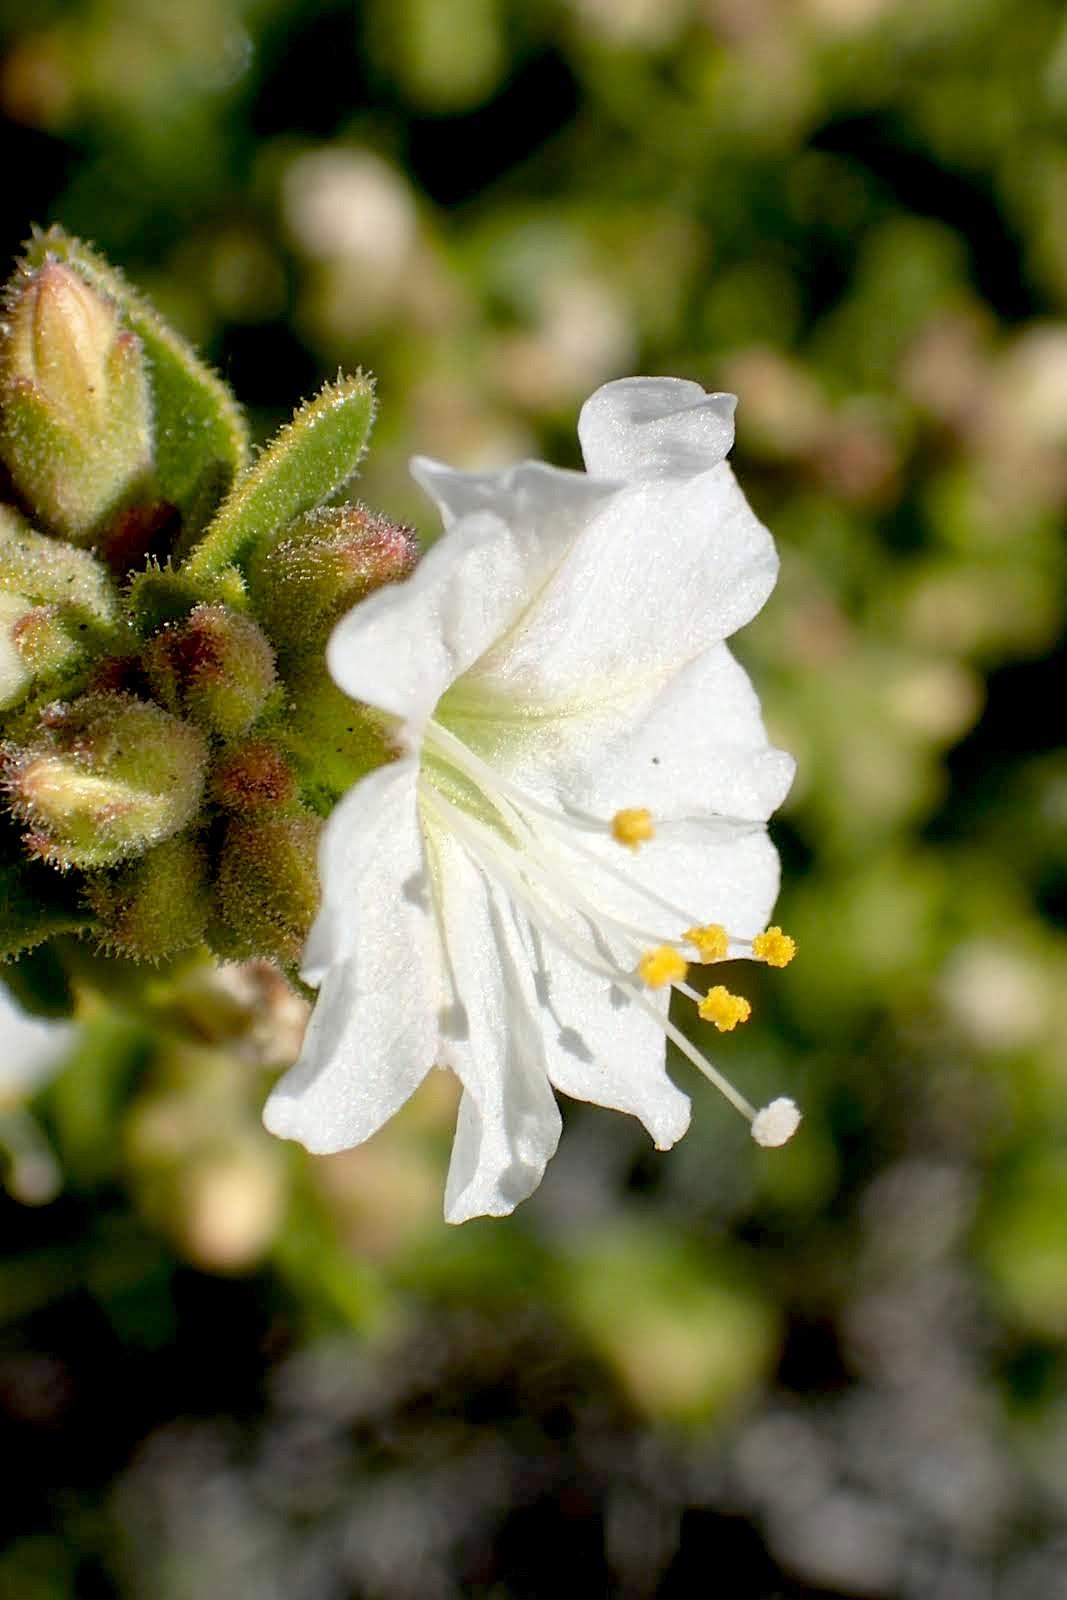 Desert Wishbone Bush (Mirabilis laevis) PC: Lee Gordon